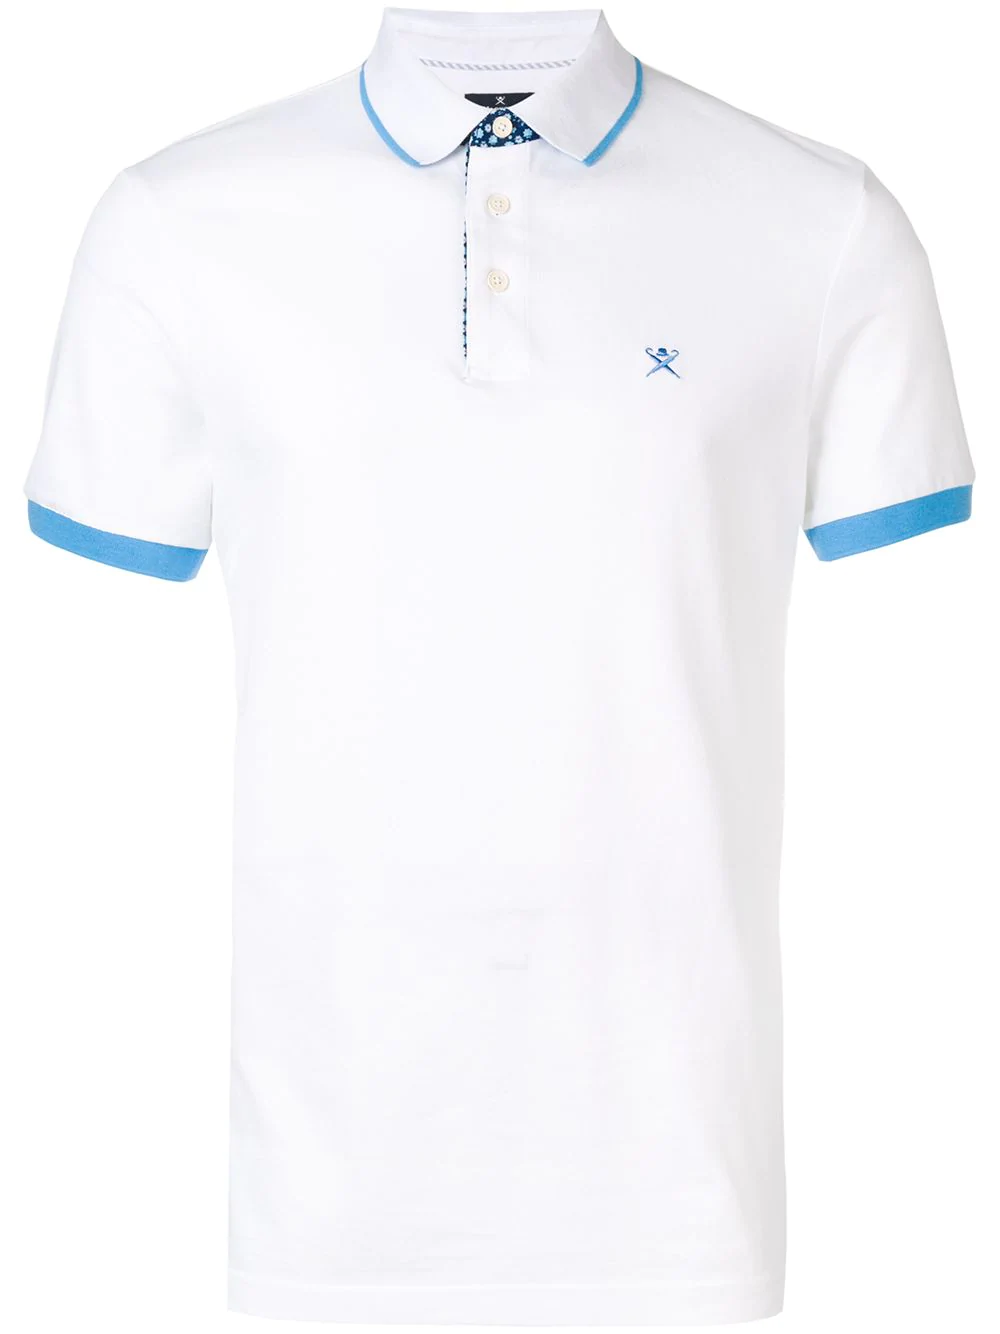 b9313a82d40d Hackett Logo Embroidered Polo Shirt - White